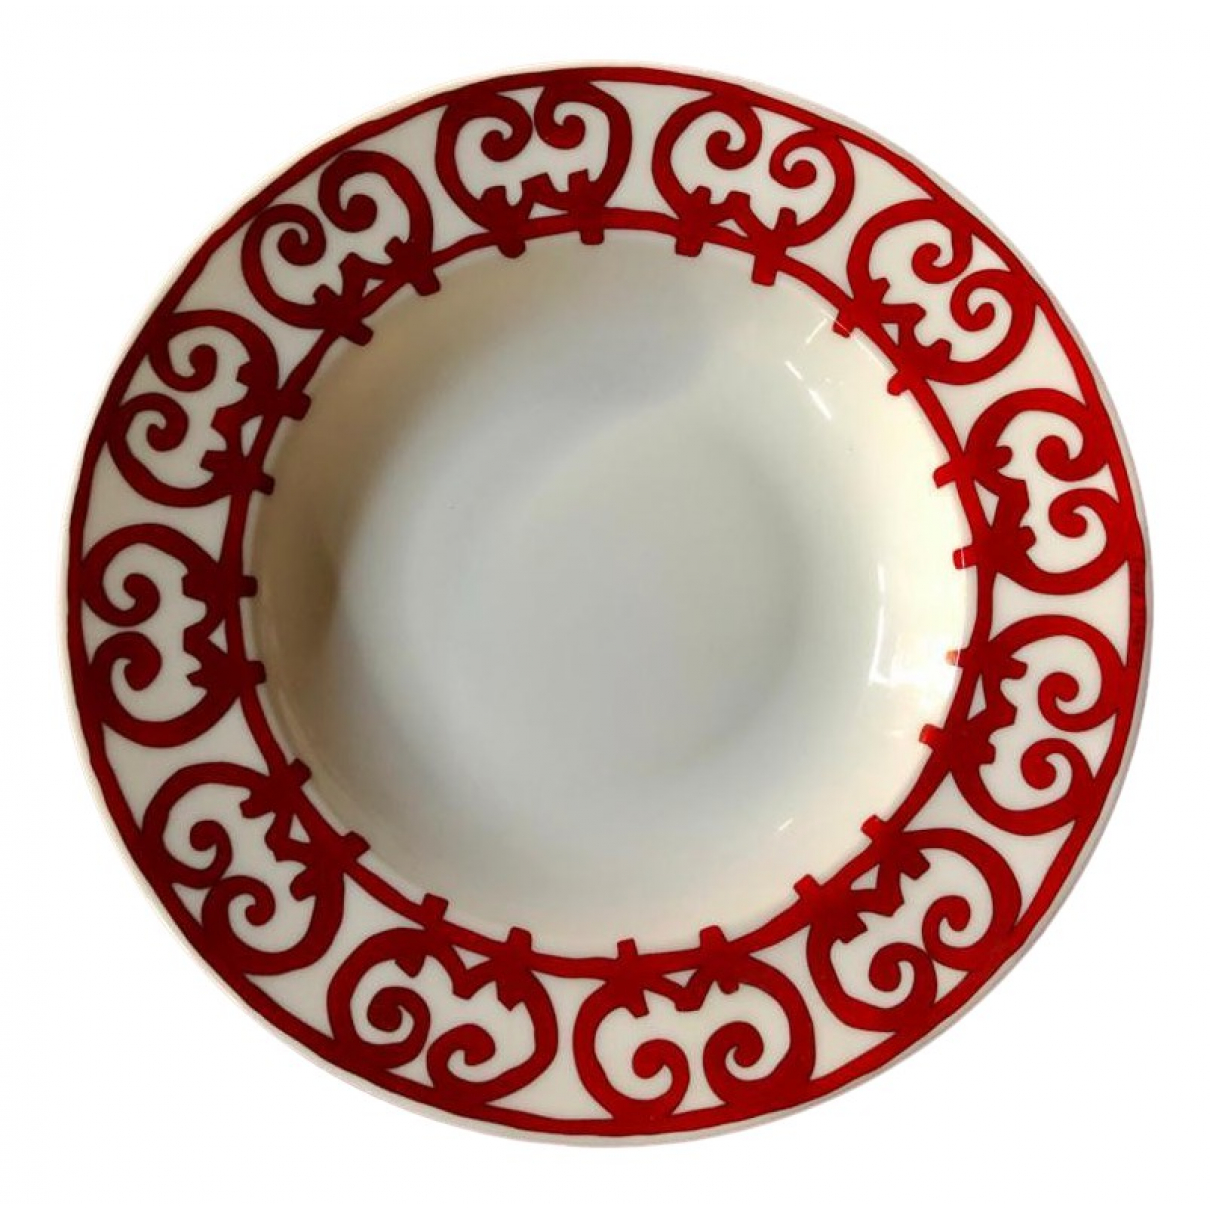 Plato Balcon du Guadalquivir de Porcelana Hermes